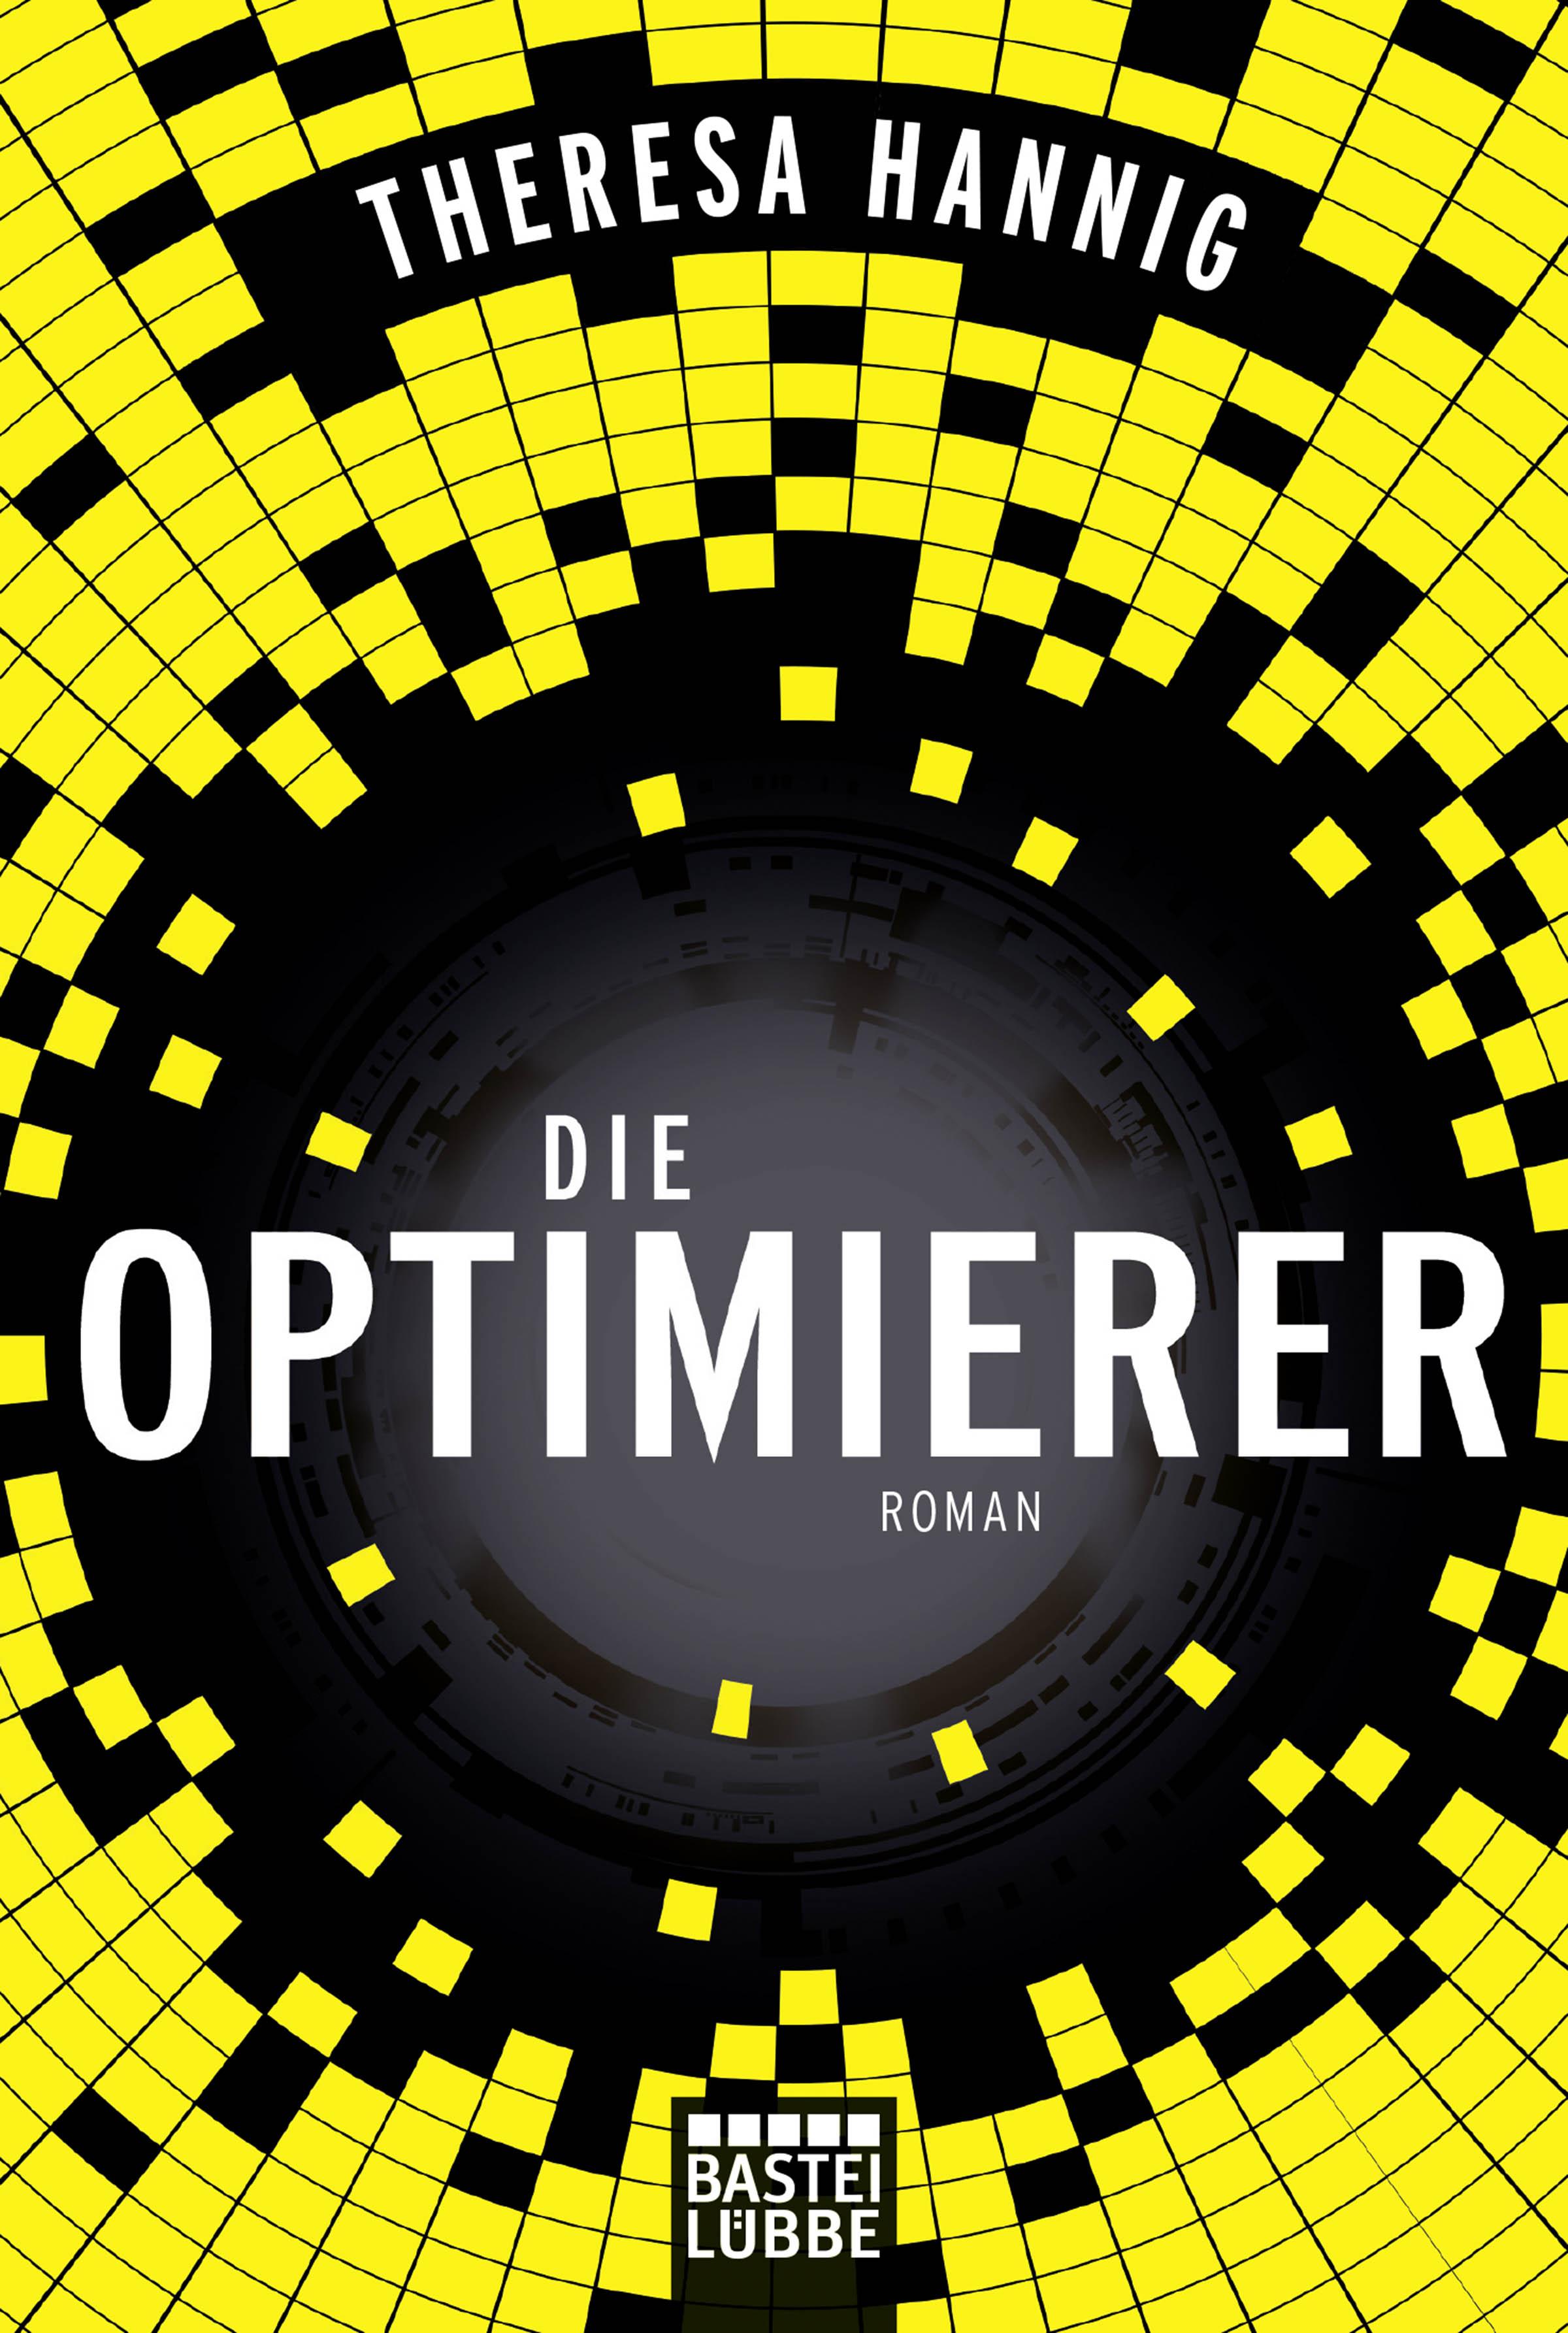 Hannig_Theresa_Optimierer_phantastik-autoren-netzwerk.jpg